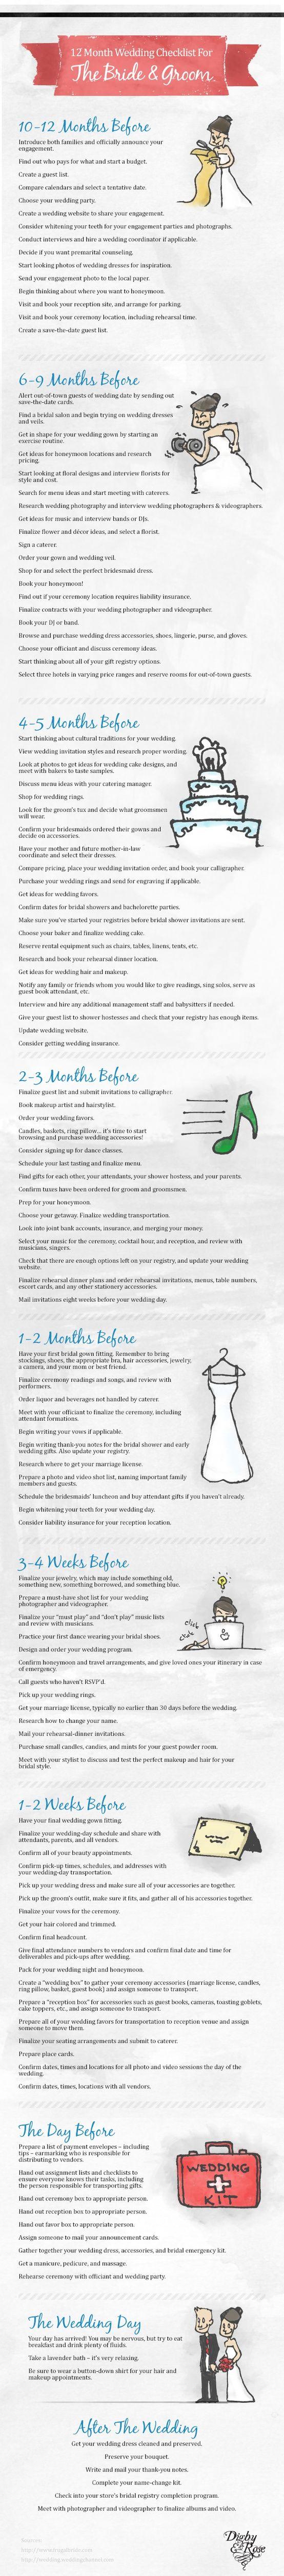 12 month wedding planning checklist will be helpful tips